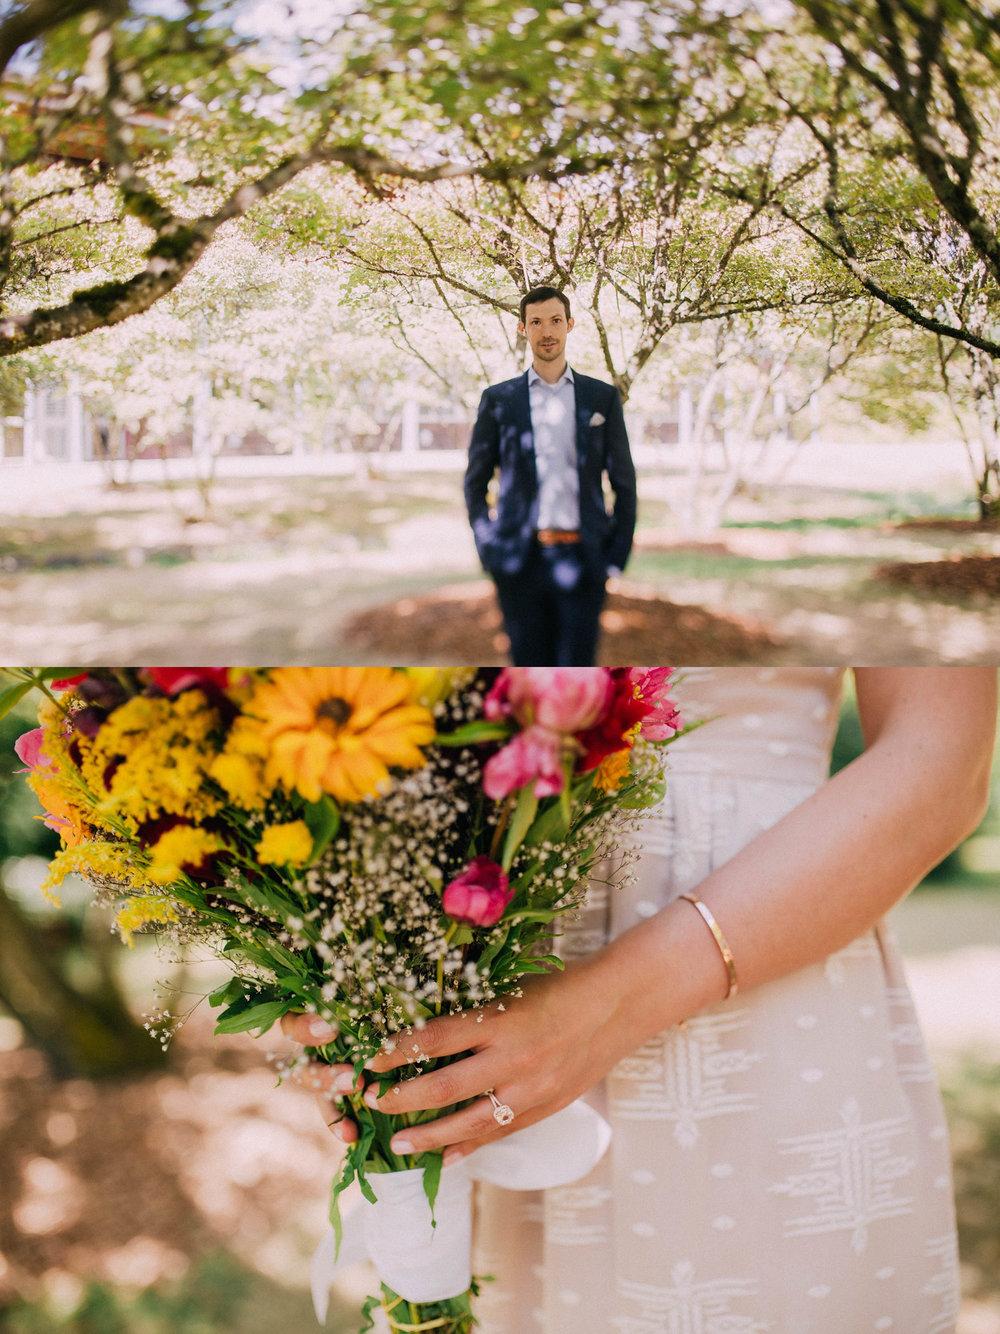 Seattle courthouse and wedding photographer ballard wedding ashley vos-9.jpg